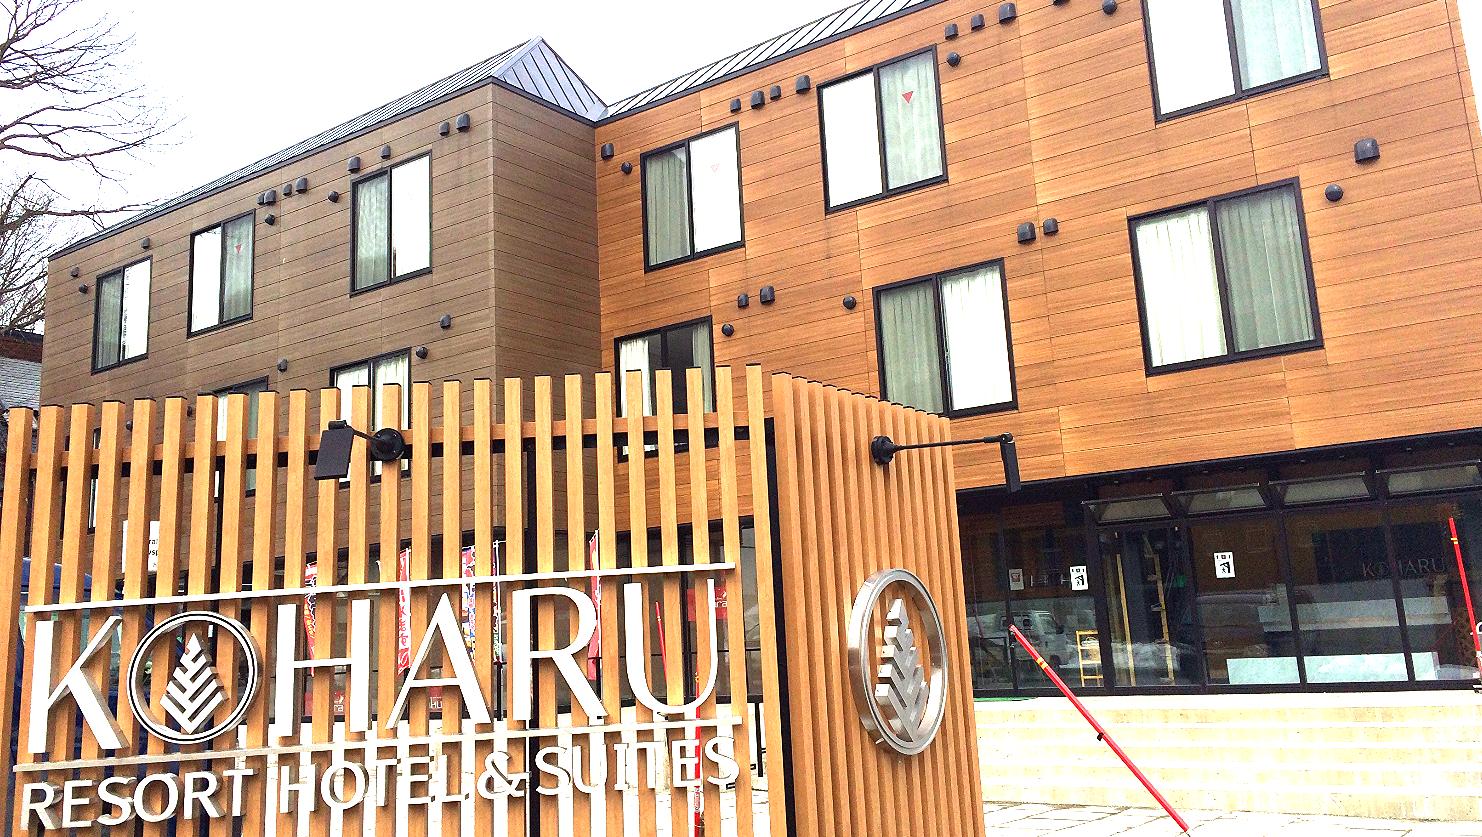 koharu-resort-hotel-suites2